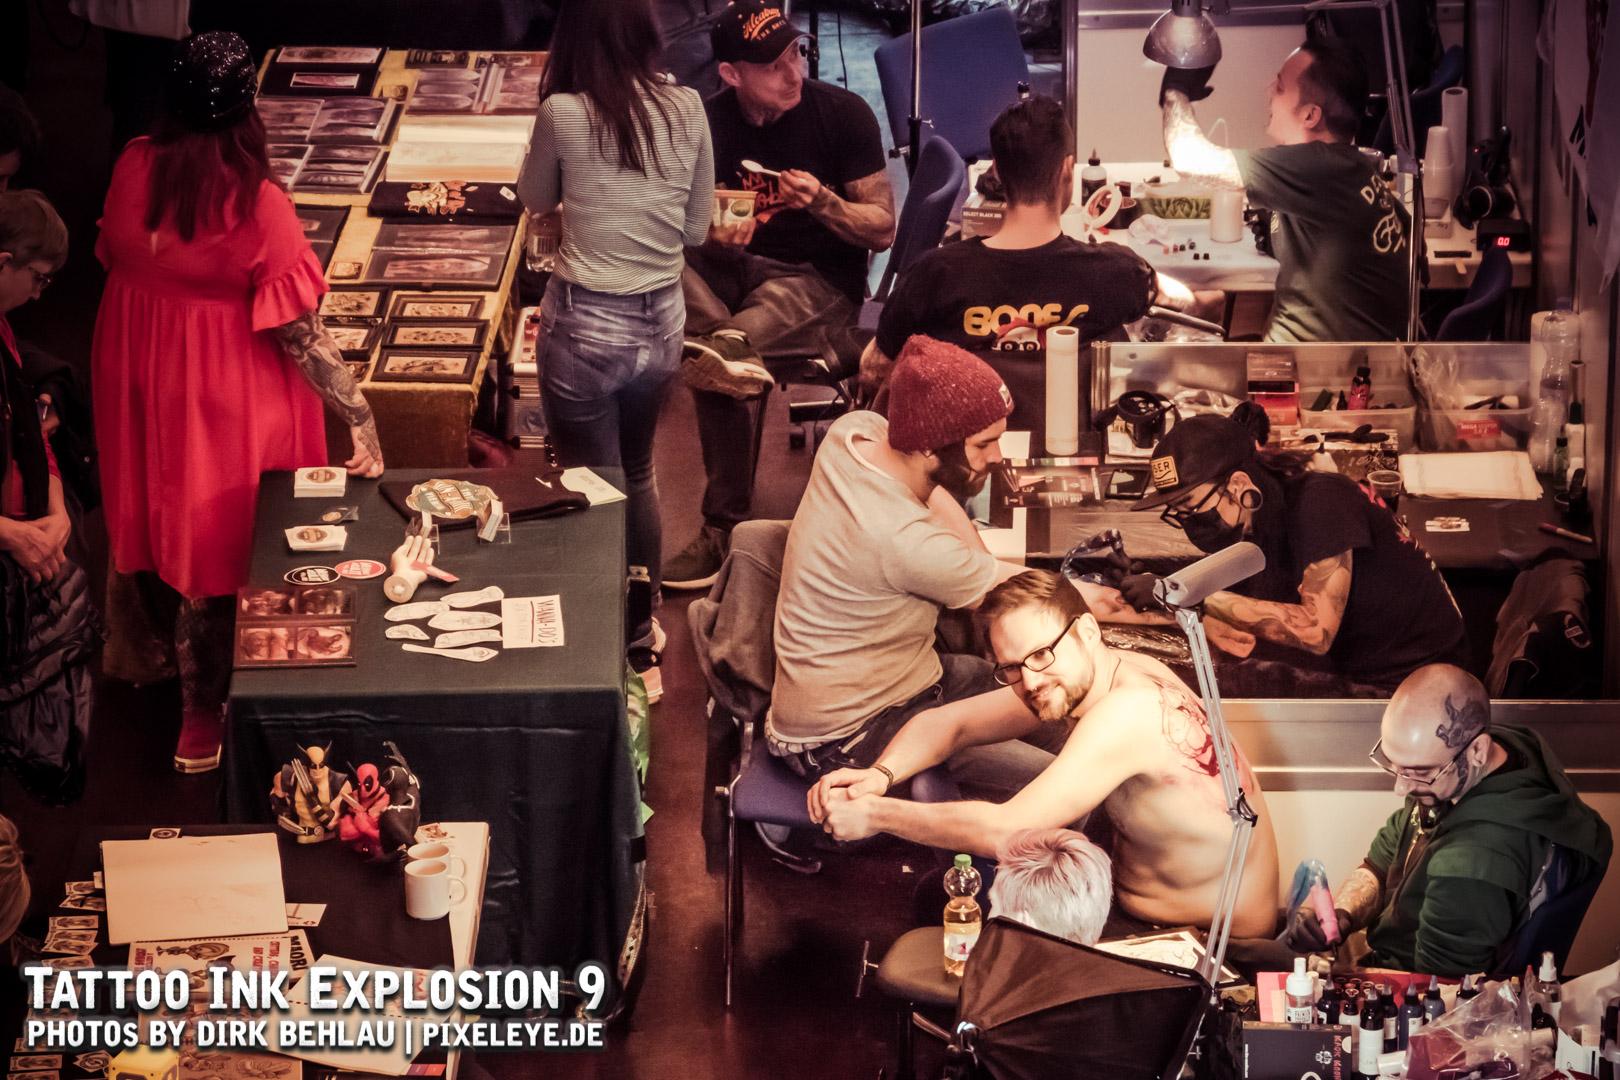 Tattoo Ink Explosion 2018 WEB by Dirk Behlau-0494.jpg